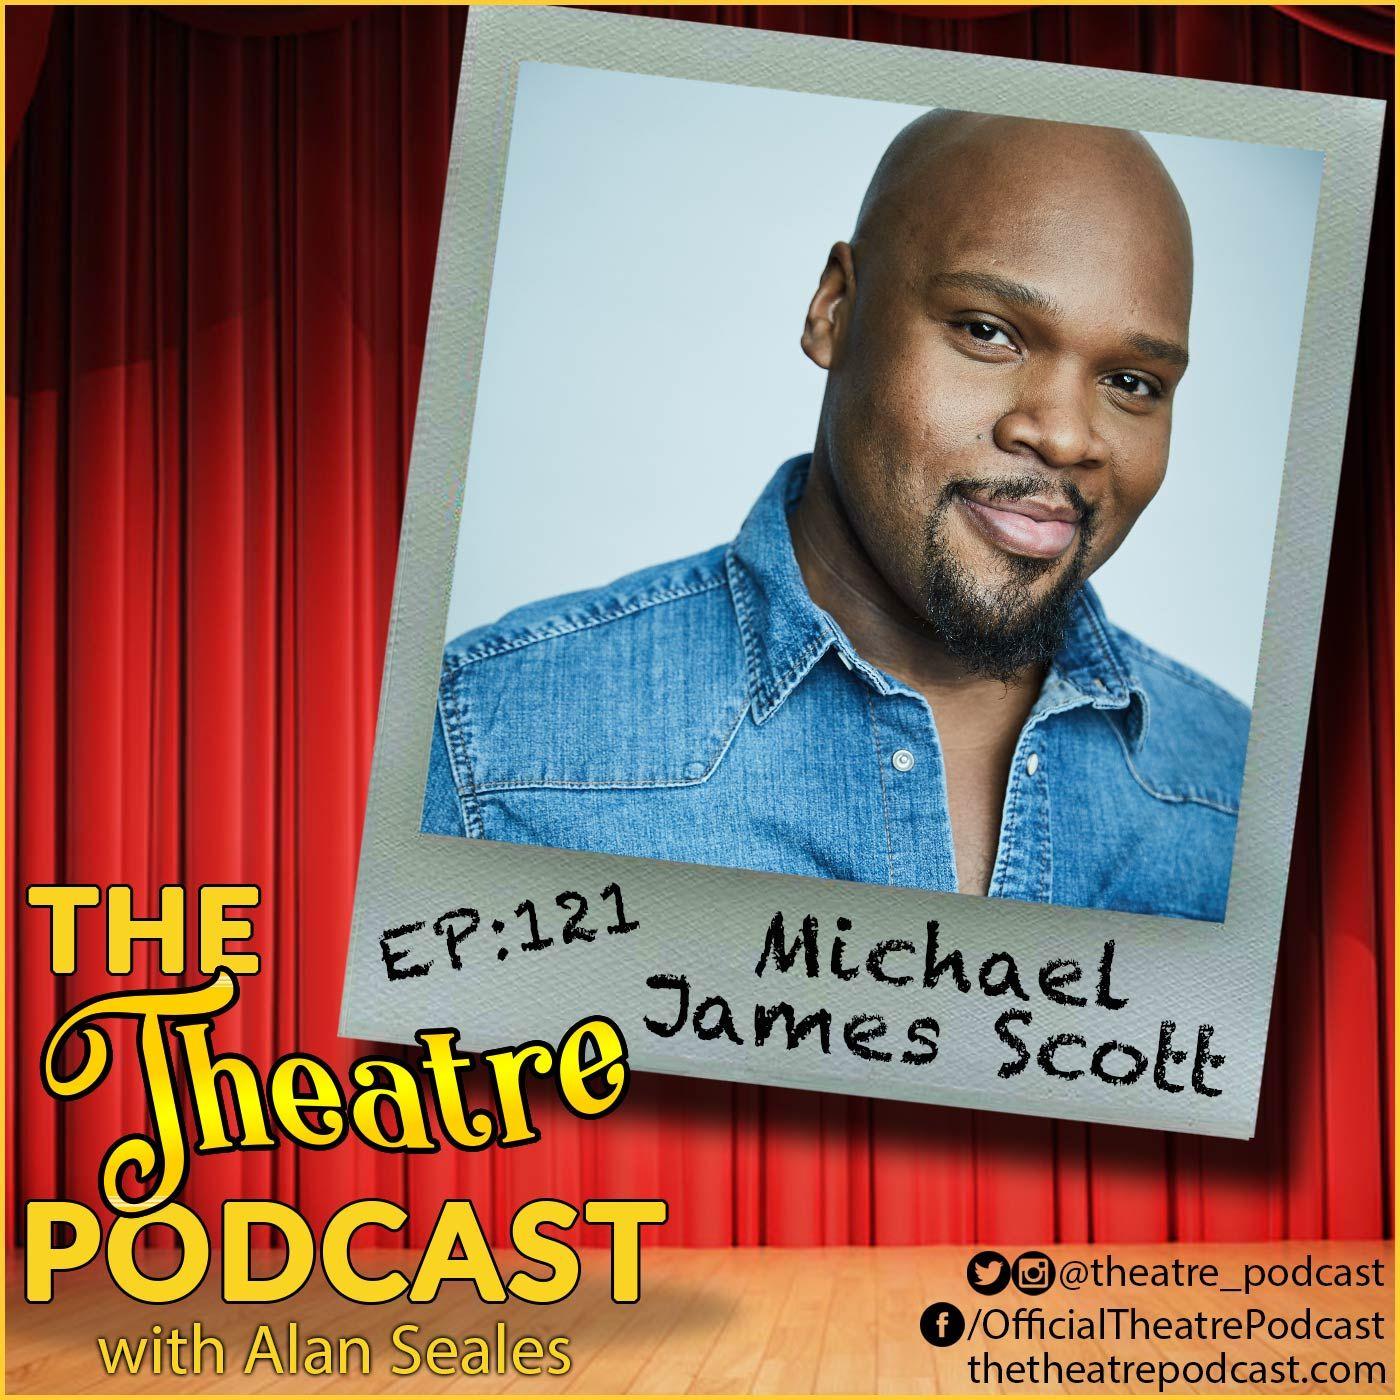 Ep121 - Michael James Scott: A Fierce Christmas, Aladdin, Something Rotten!, Book of Mormon